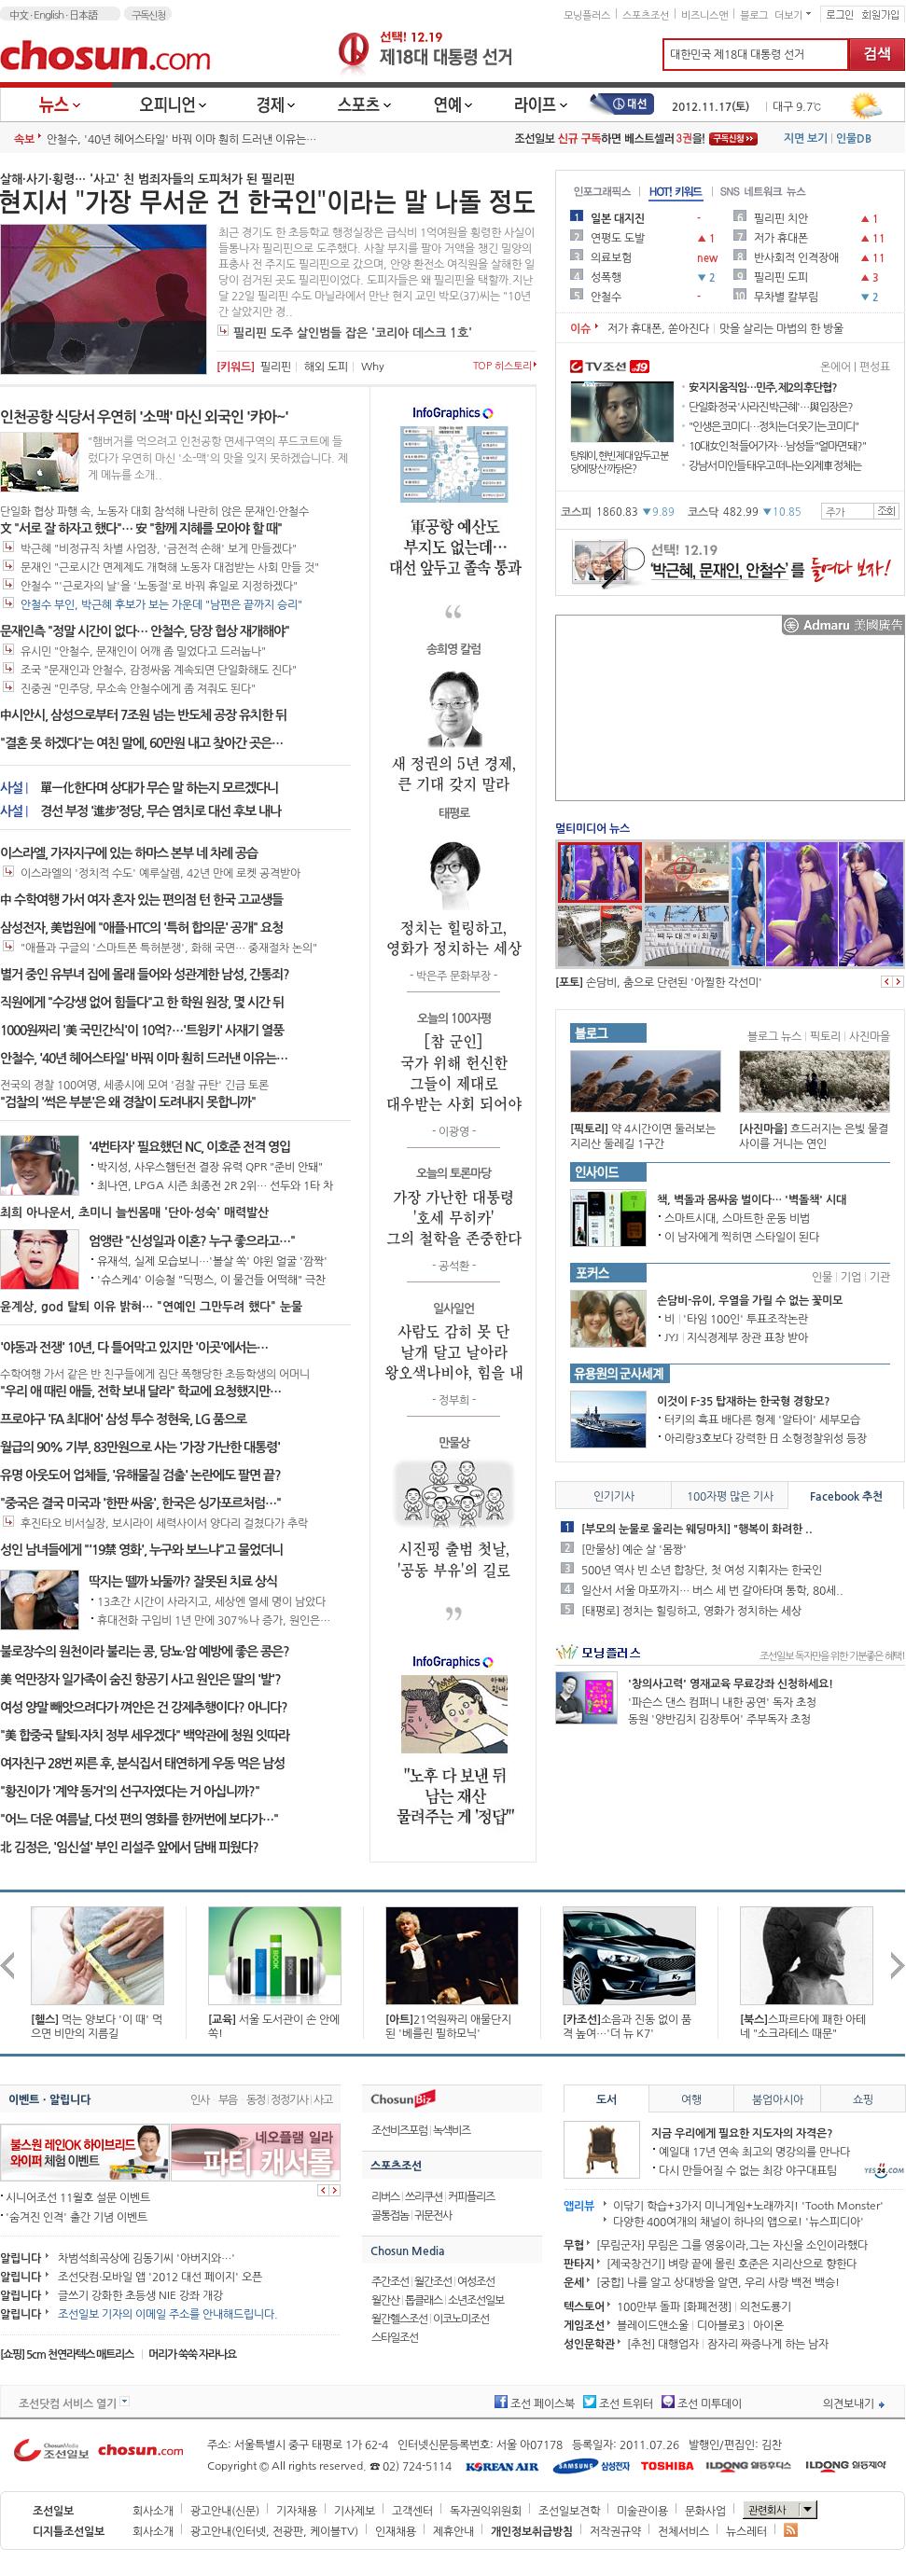 chosun.com at Saturday Nov. 17, 2012, 9:04 a.m. UTC